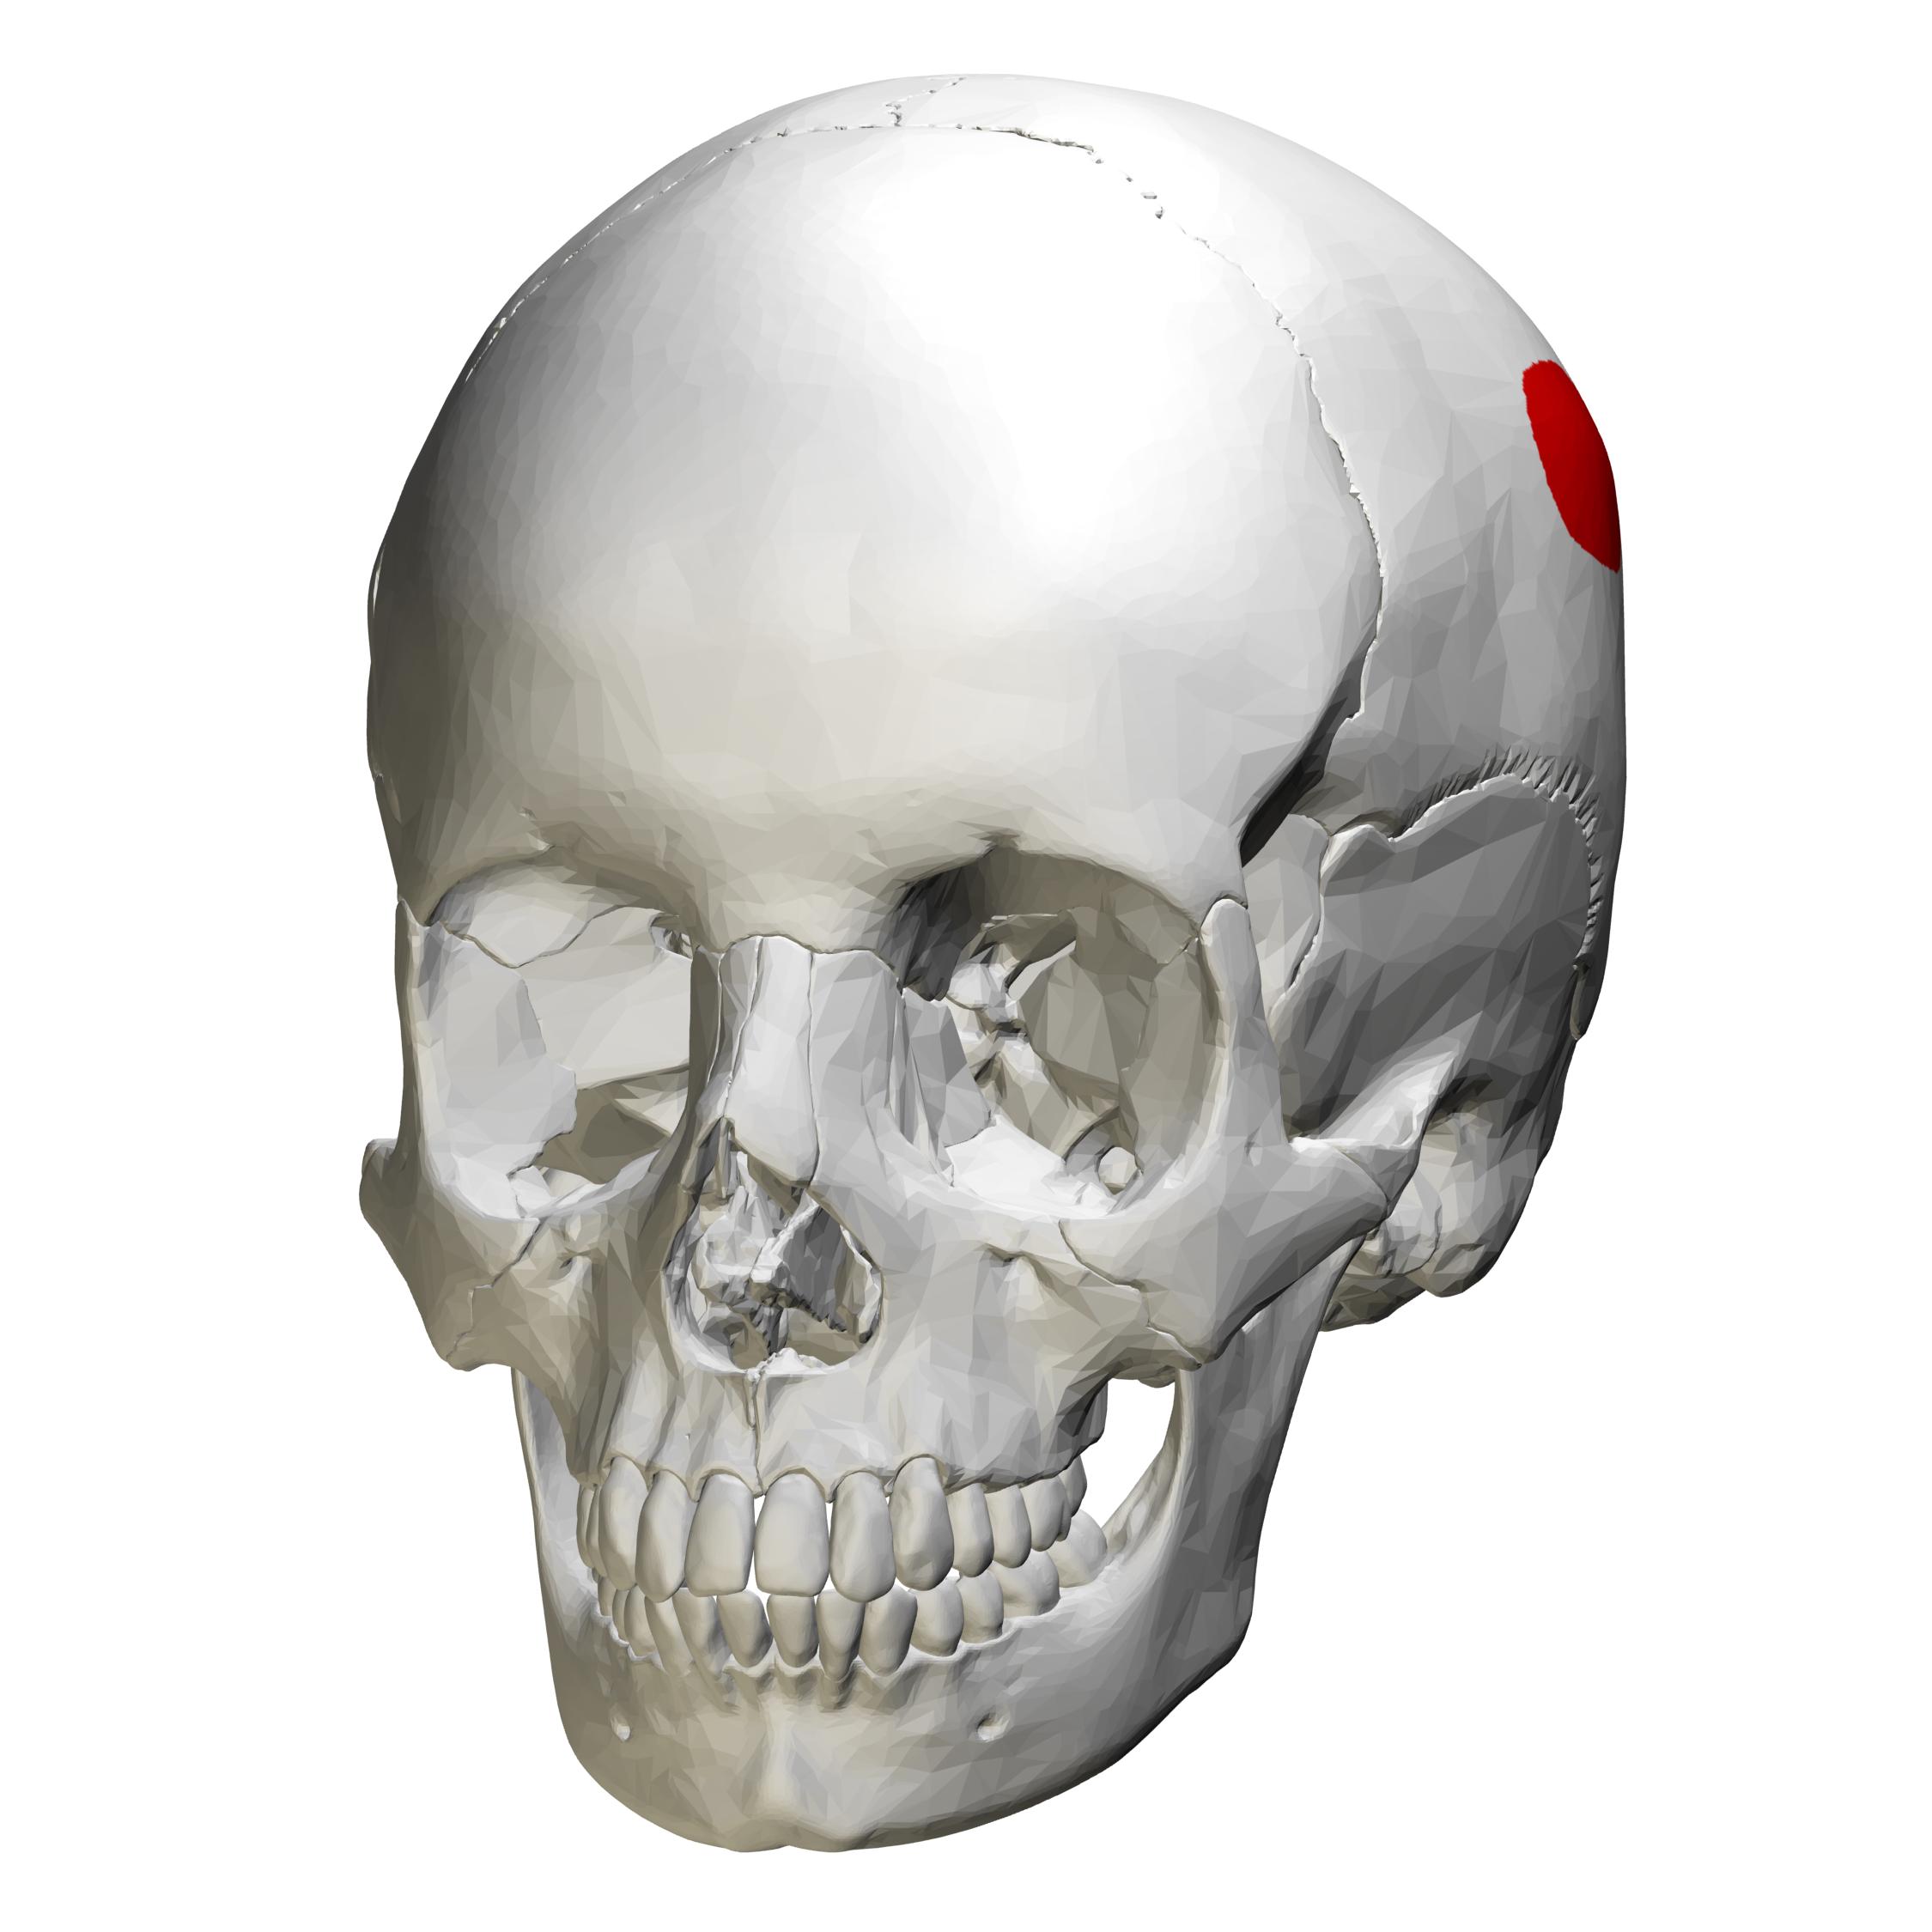 Fileparietal Eminence Skull Anterior View02g Wikimedia Commons